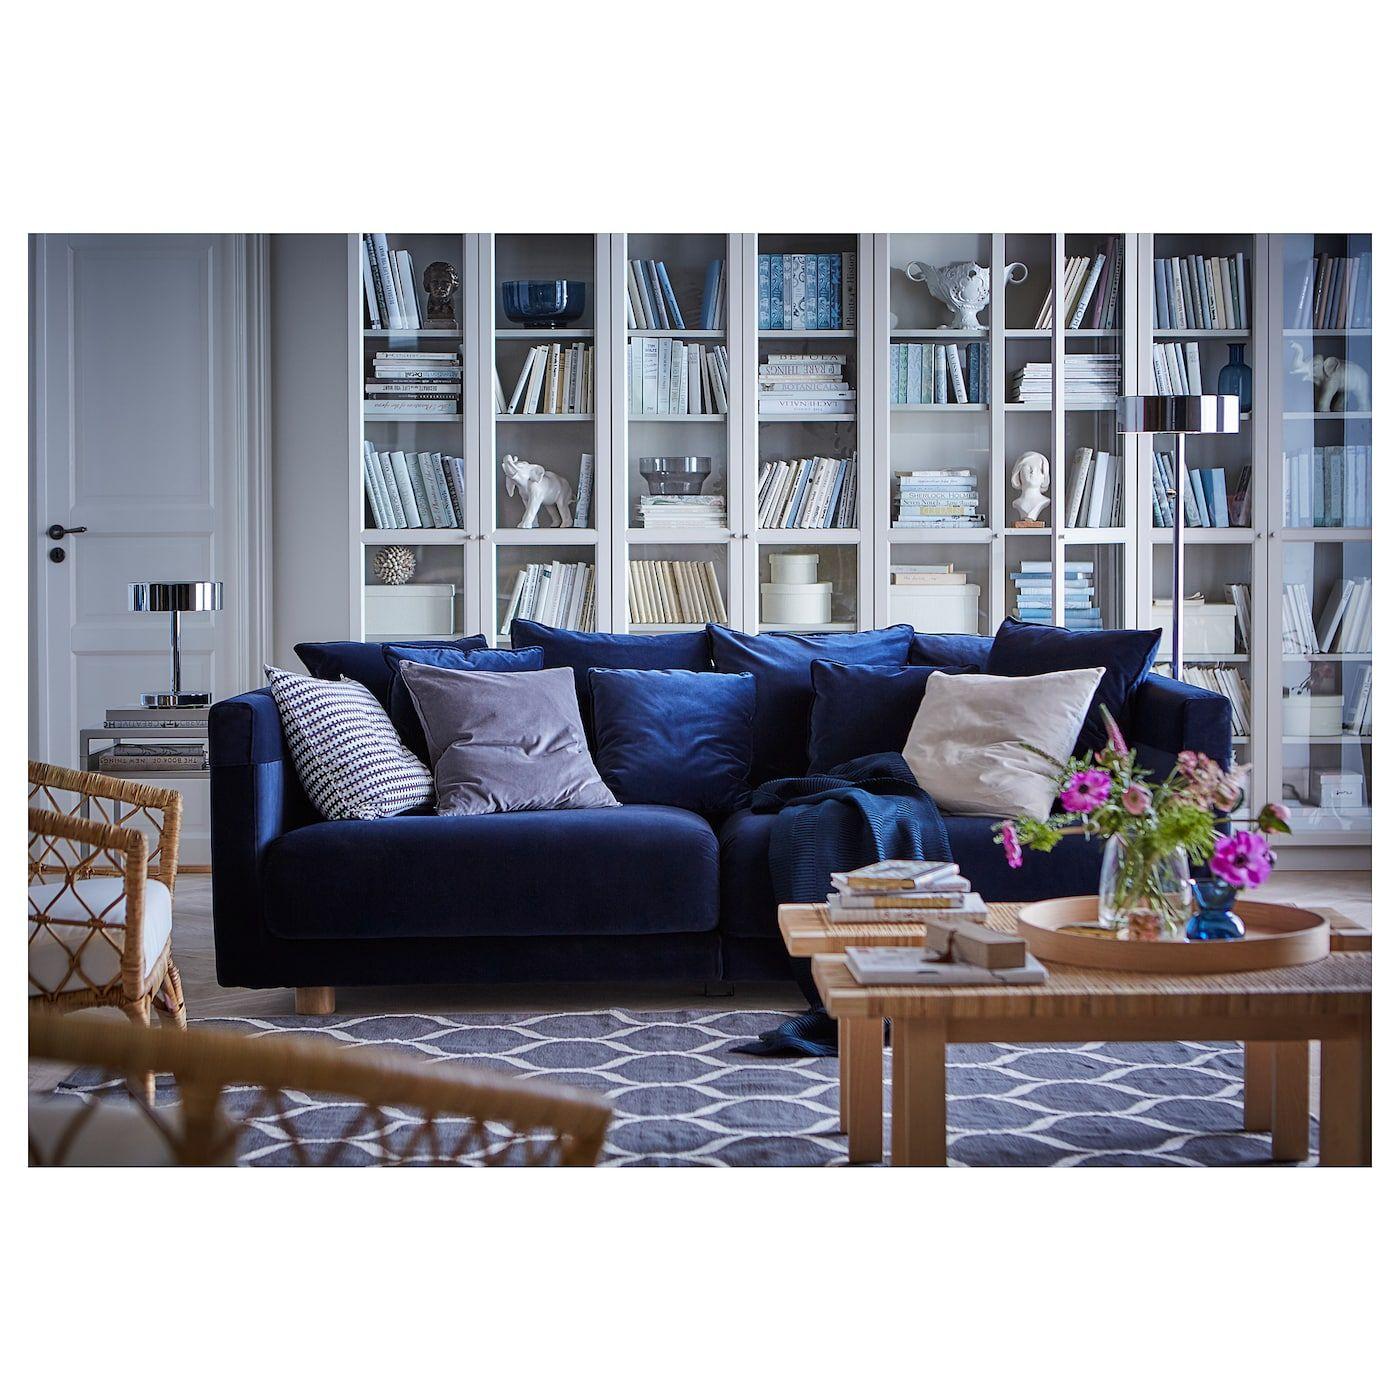 Stockholm 2017 3 Zitsbank Sandbacka Donkerblauw Ikea In 2021 Blue Sofa Living Ikea Stockholm Three Seat Sofa [ 1400 x 1400 Pixel ]